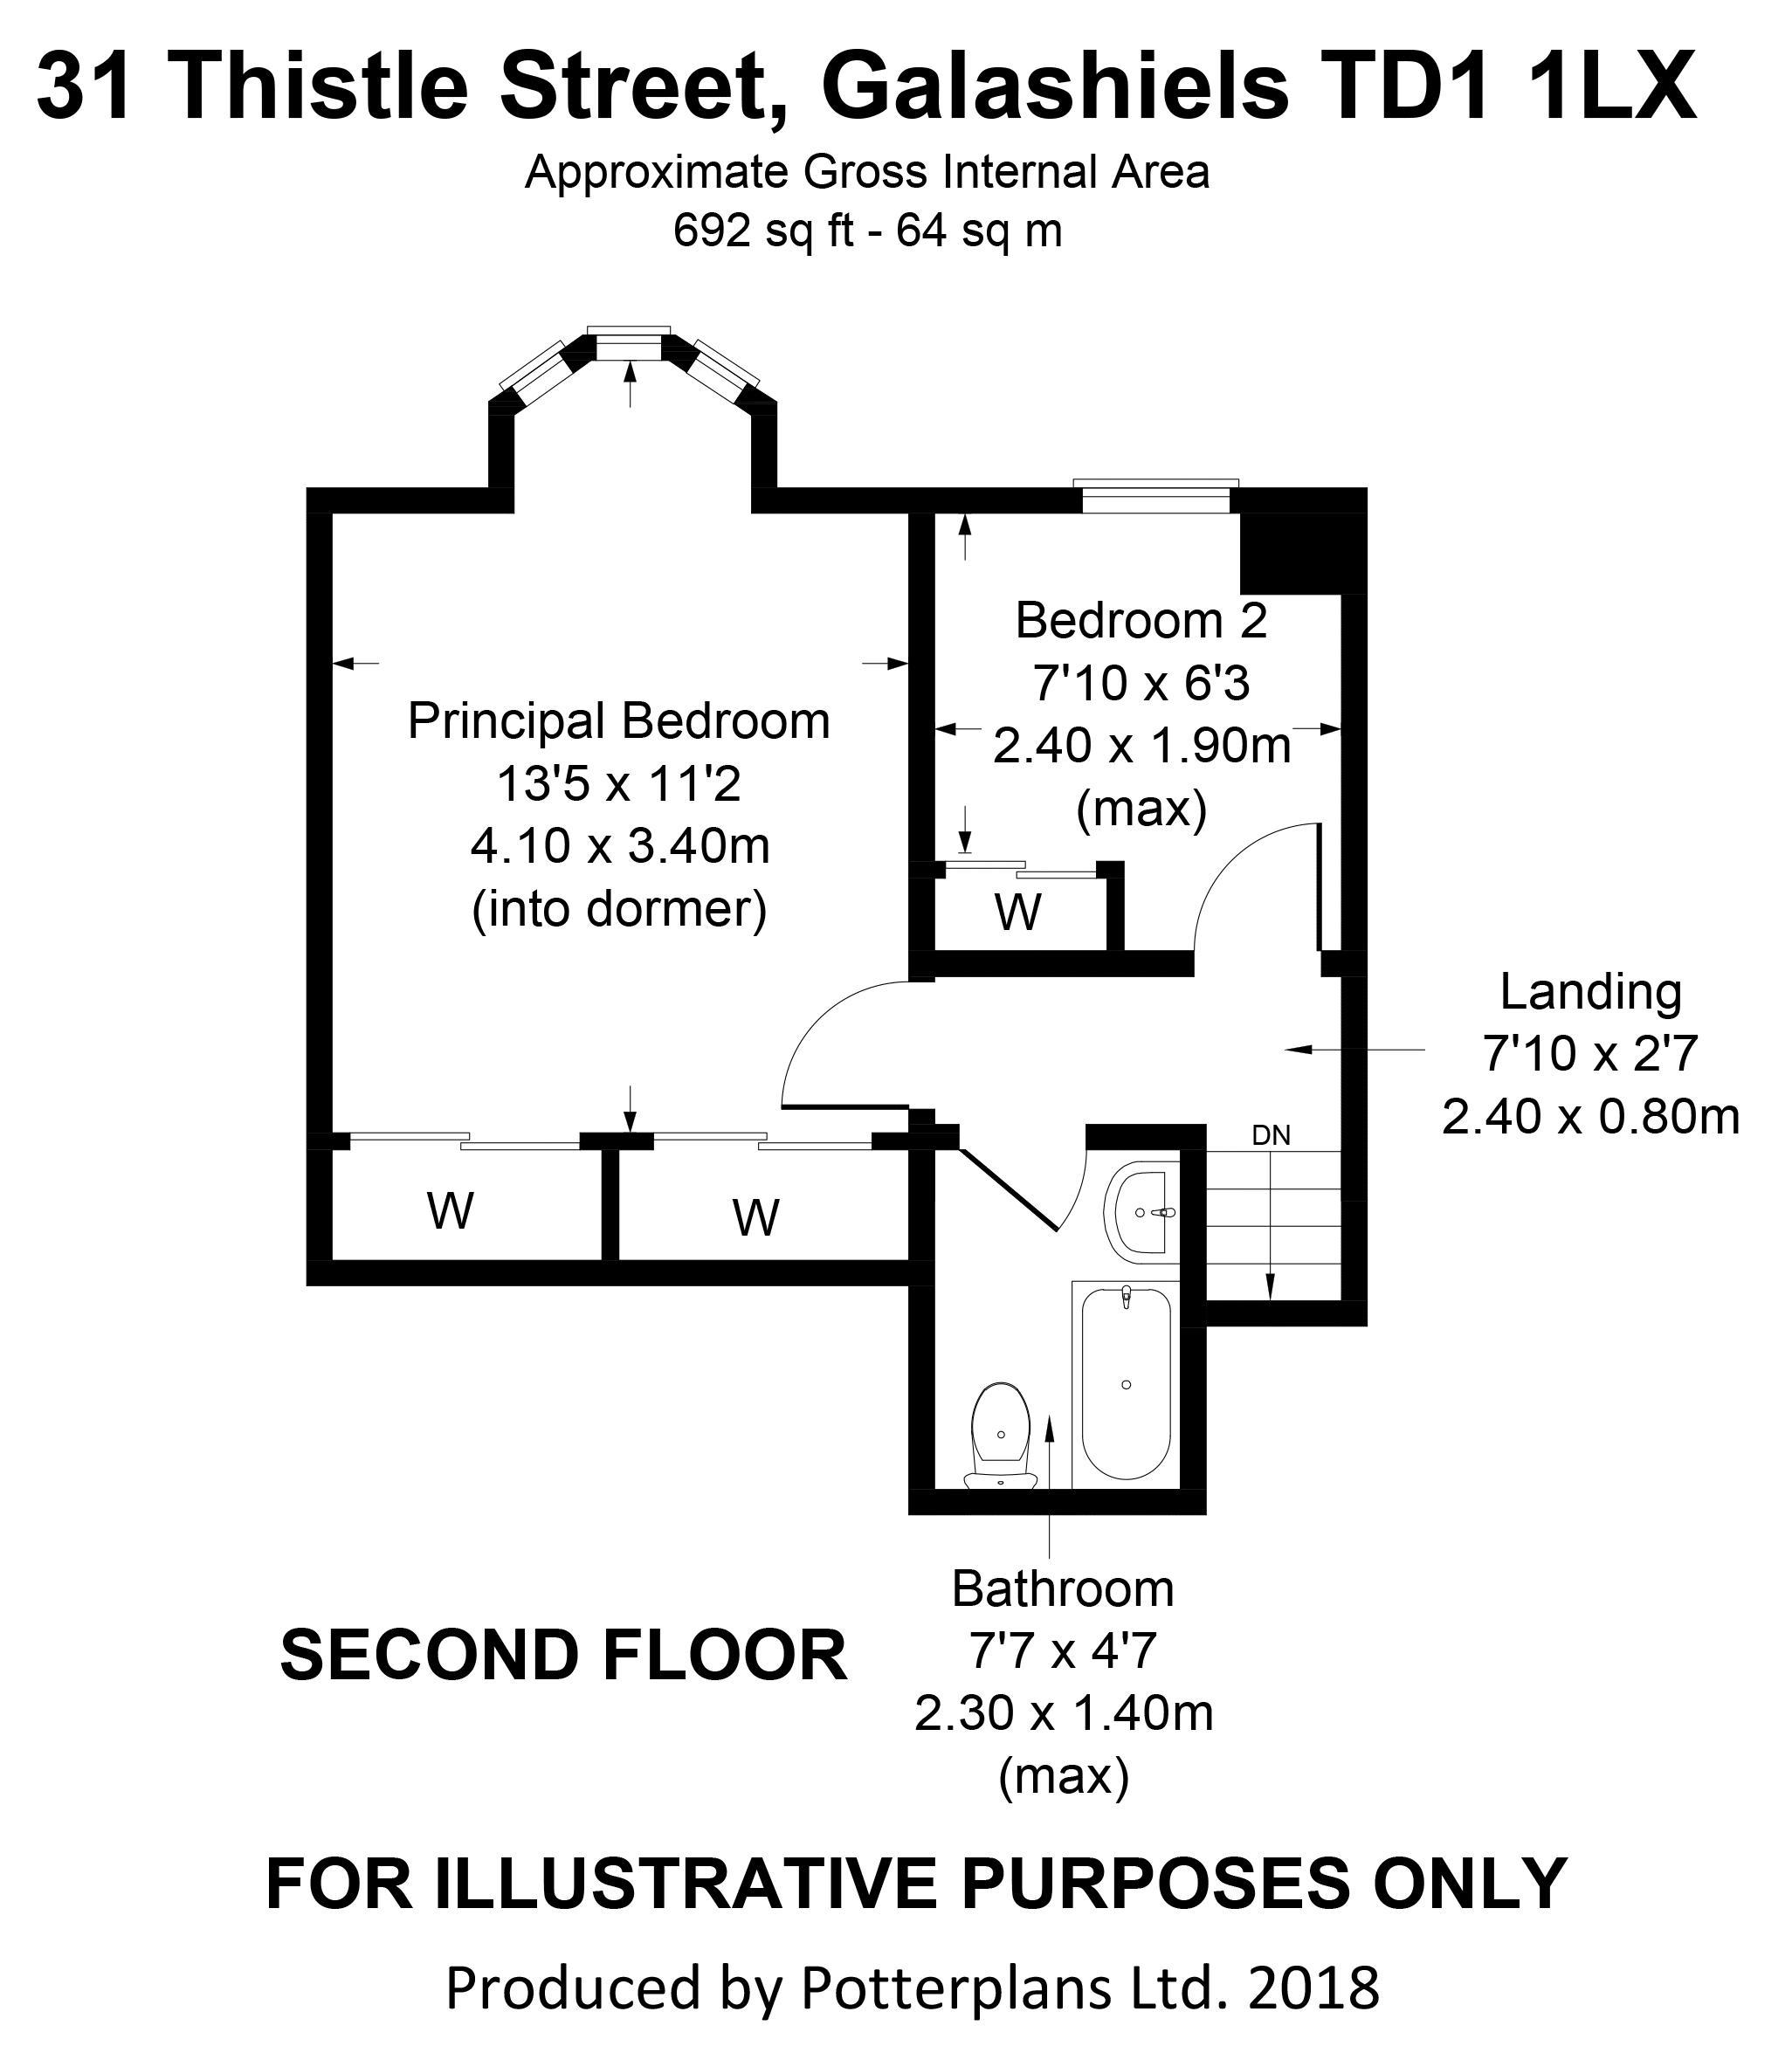 31 Thistle Street Second Floor